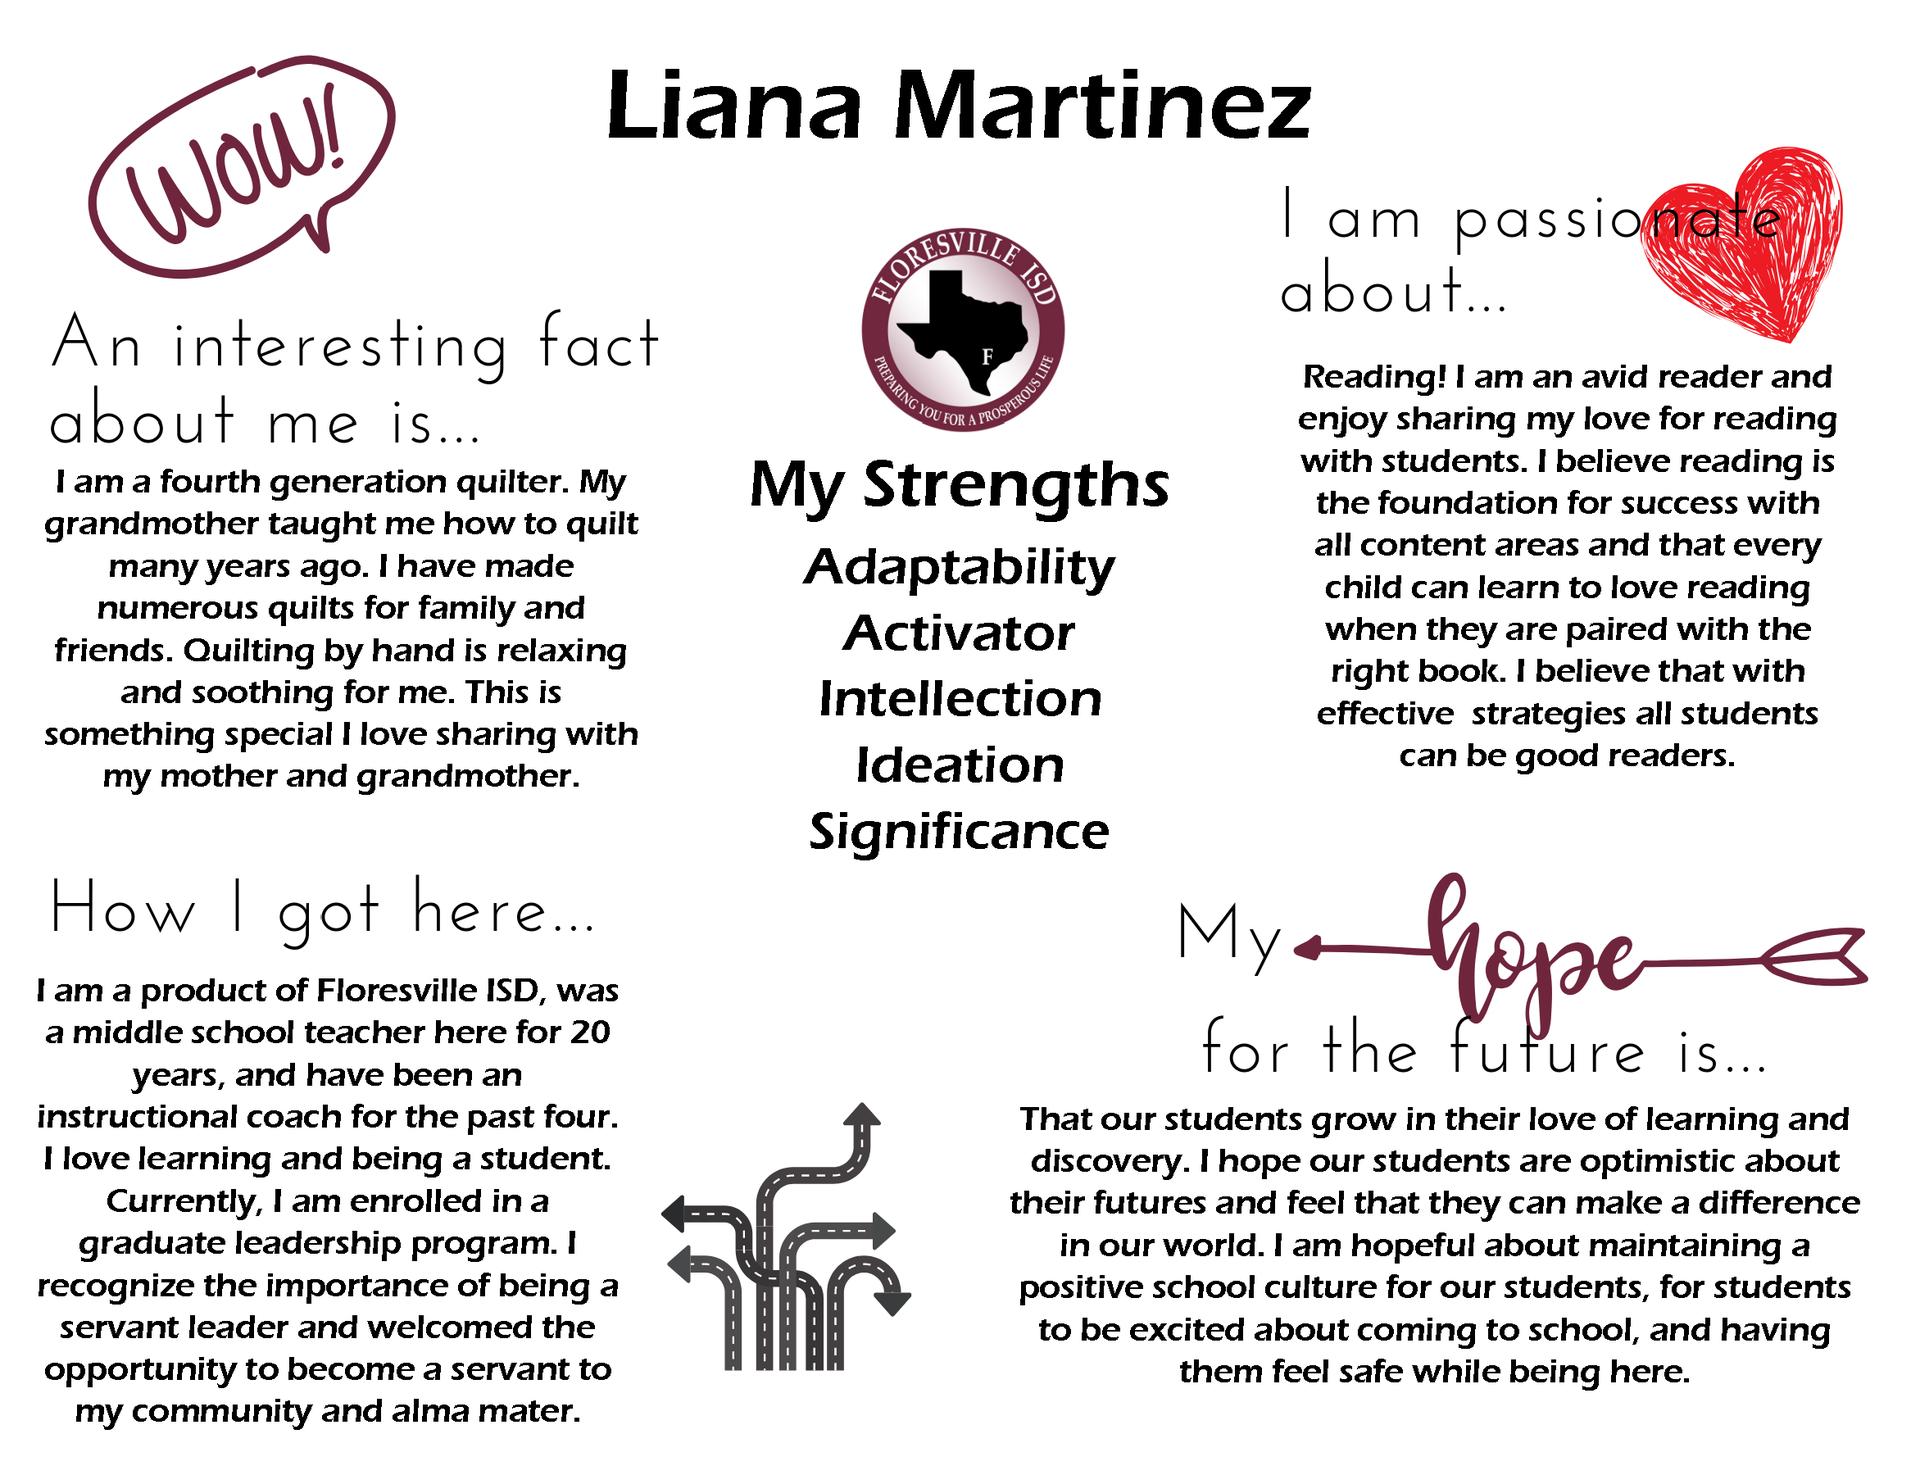 All About Liana Martinez